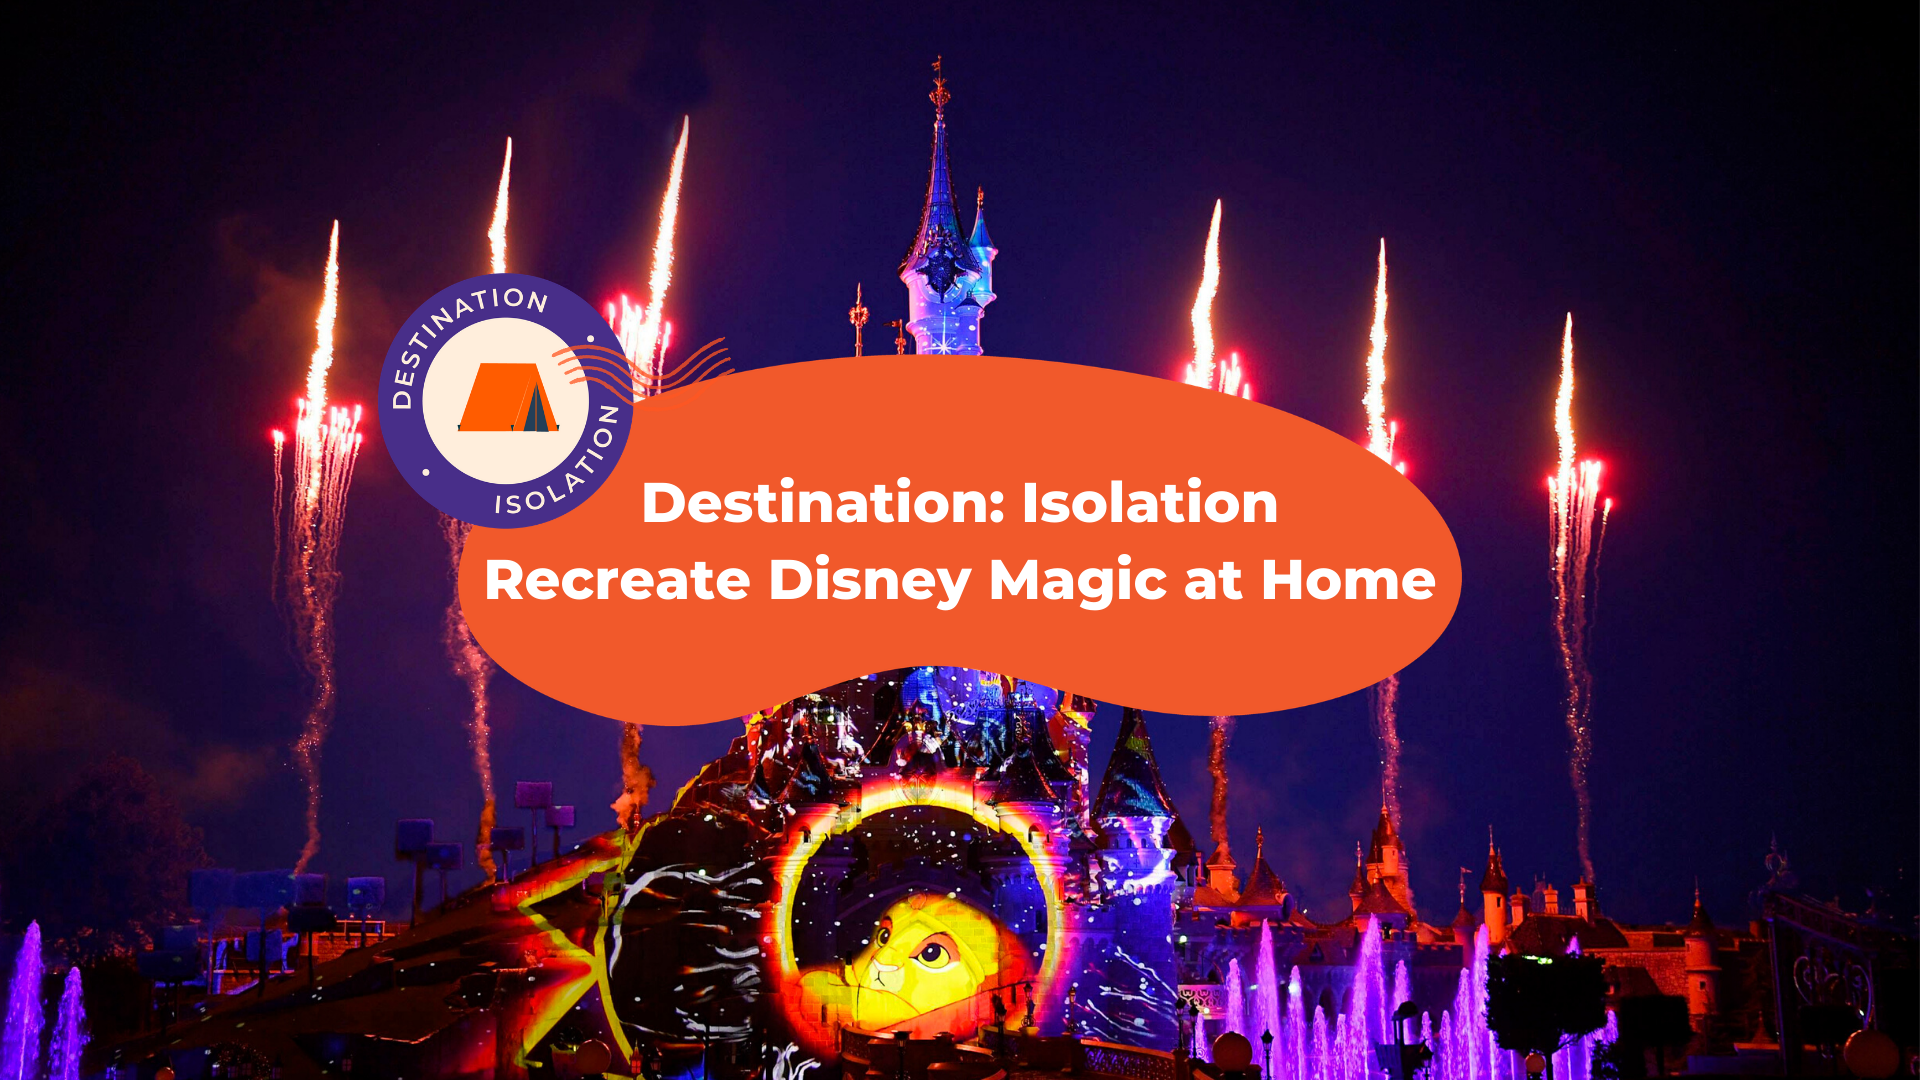 Destination: Isolation - Recreate Disney Magic At Home